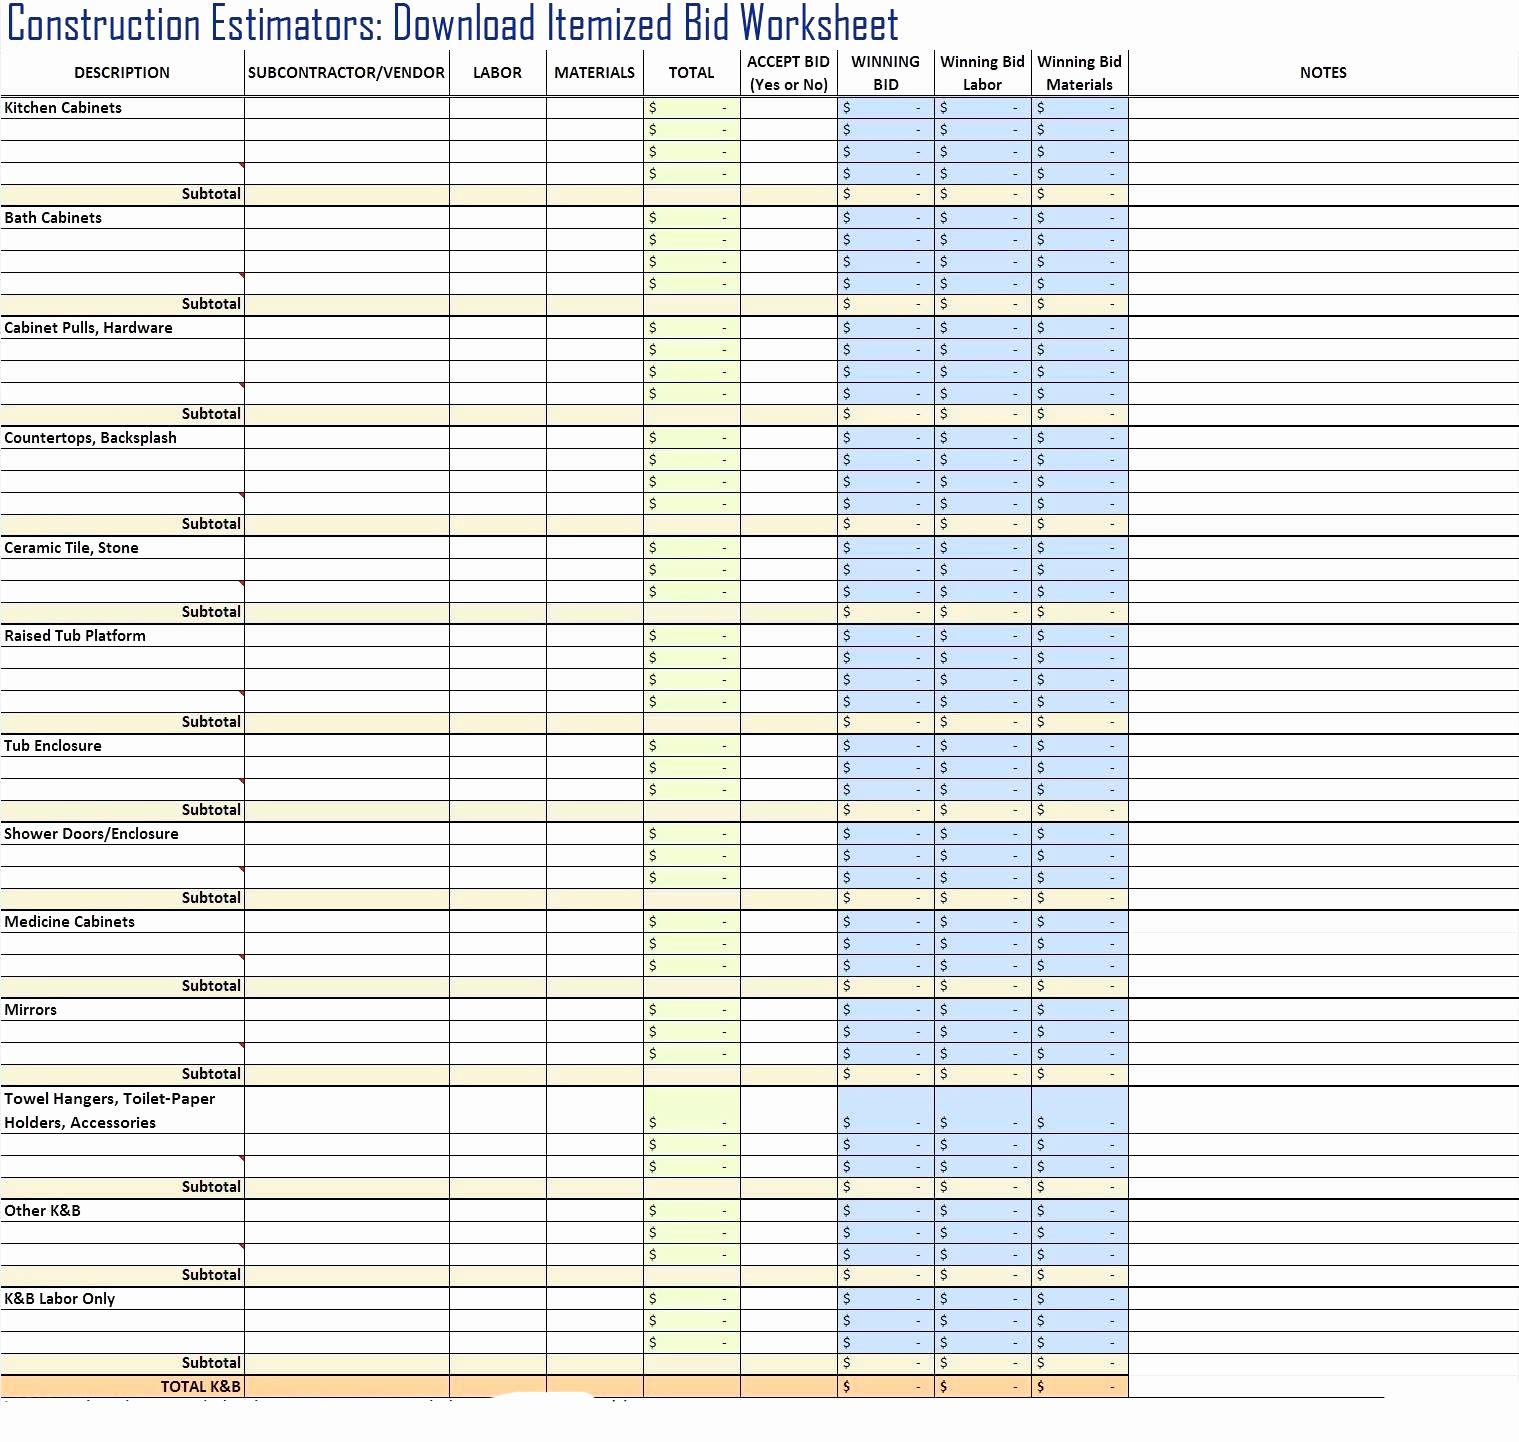 Bid Spreadsheet Intended For Construction Bid Tracking Spreadsheet Unique Free Construction